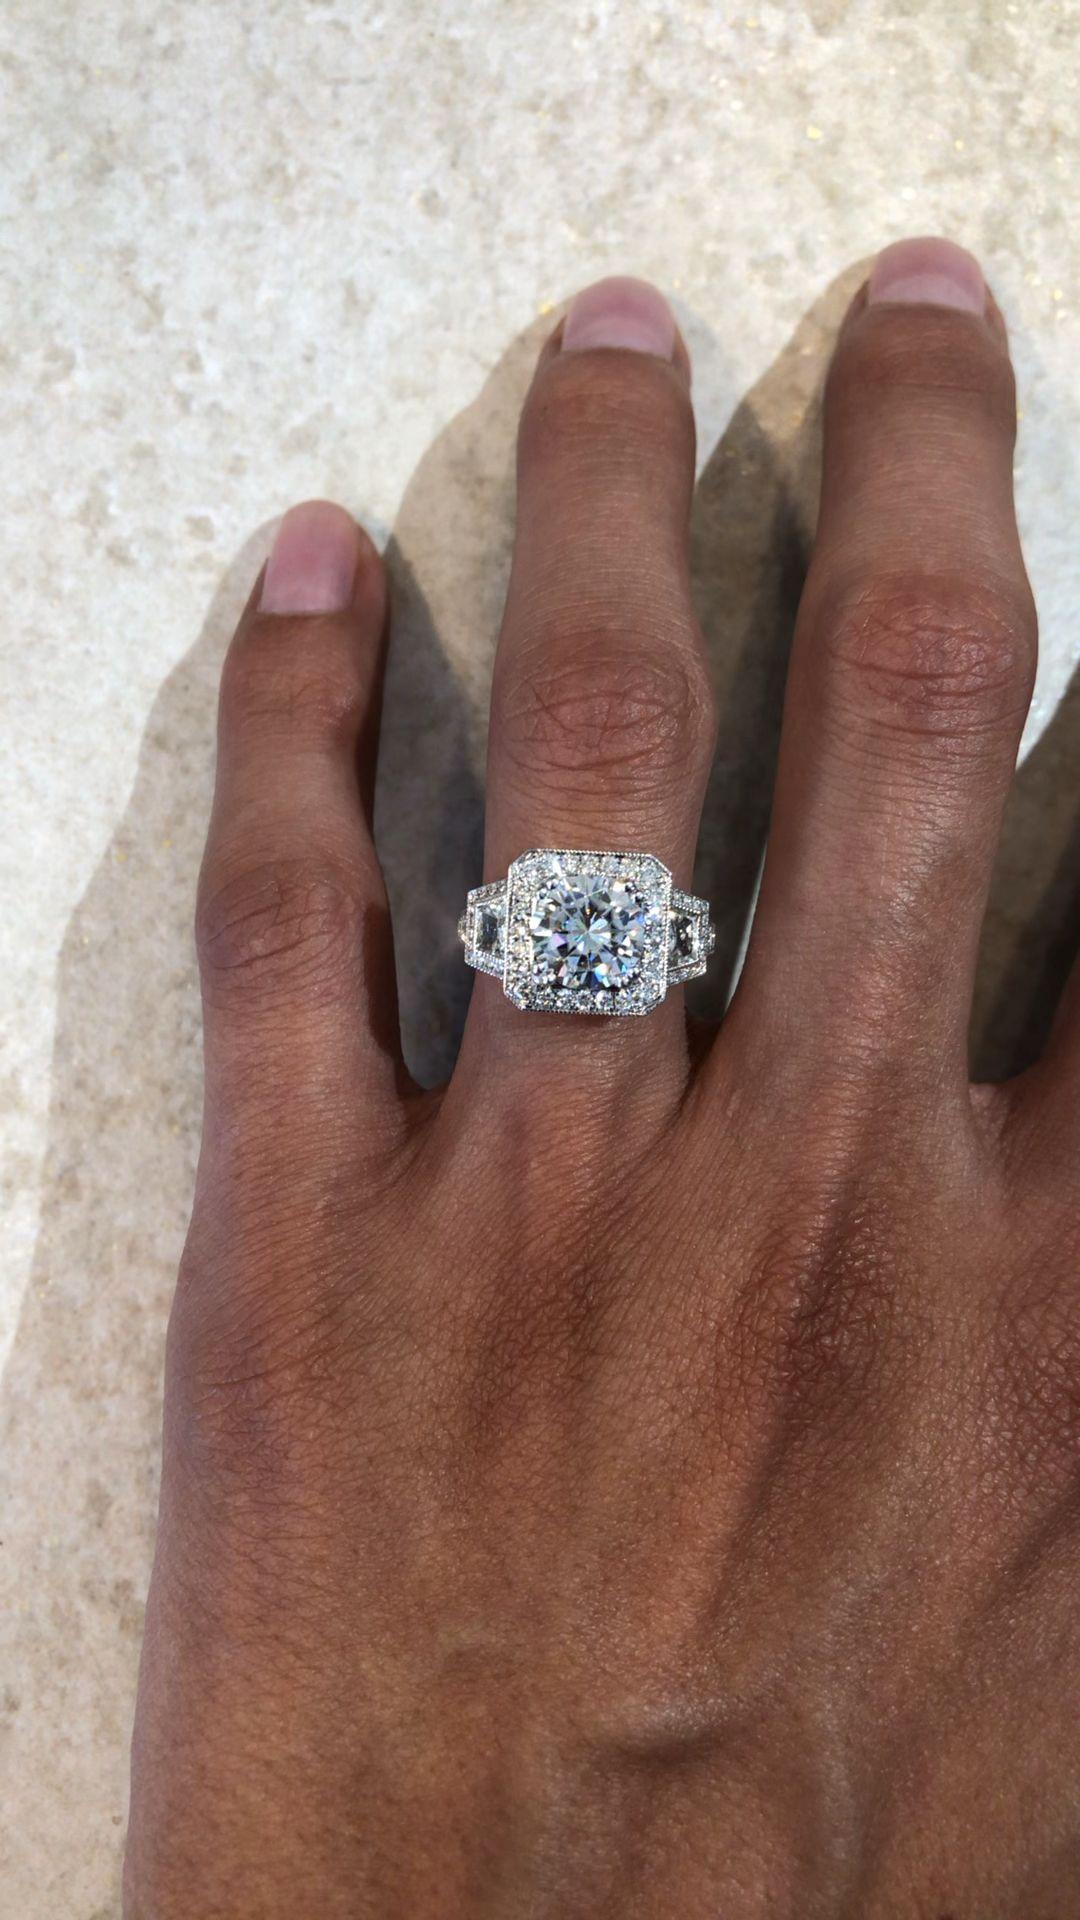 2 Carat Round Moissanite & Diamond Trapezoid Vintage Halo Engagement Ring